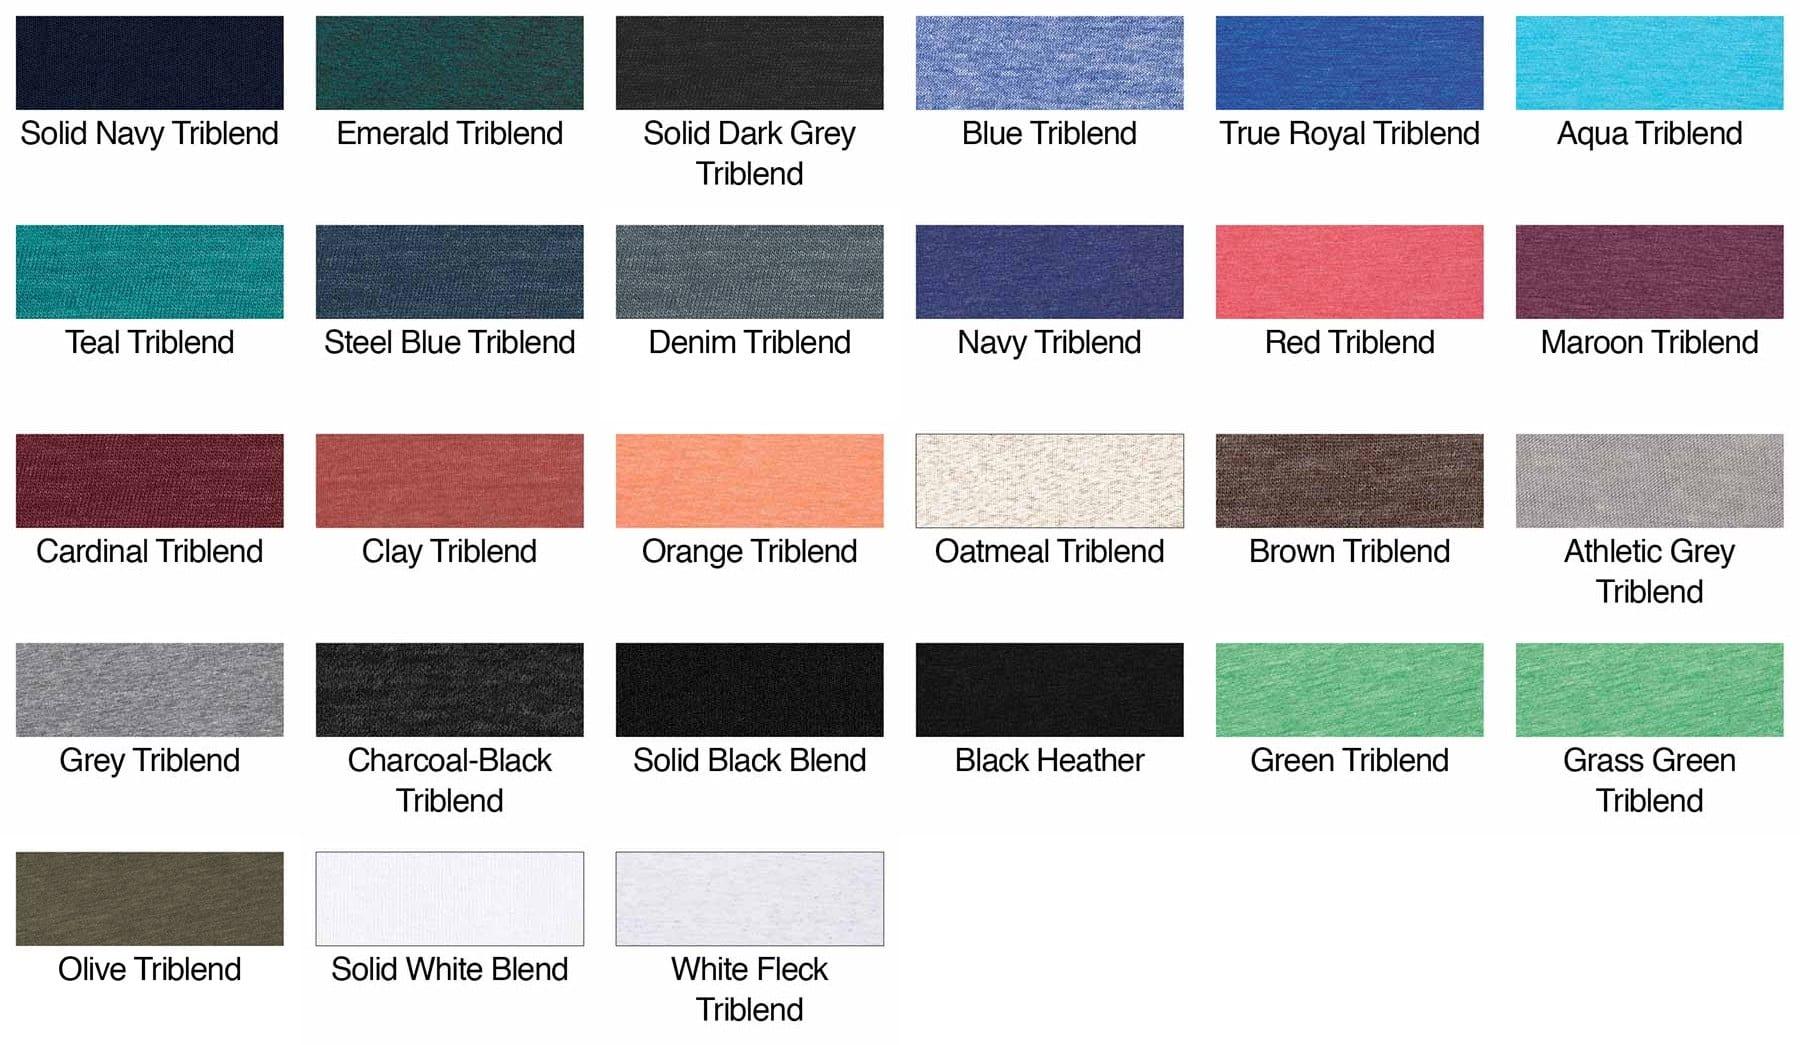 d6eeb9633 personalized shirts bella canvas 3415c unisex custom triblend shirt sleeve v -neck t shirt color